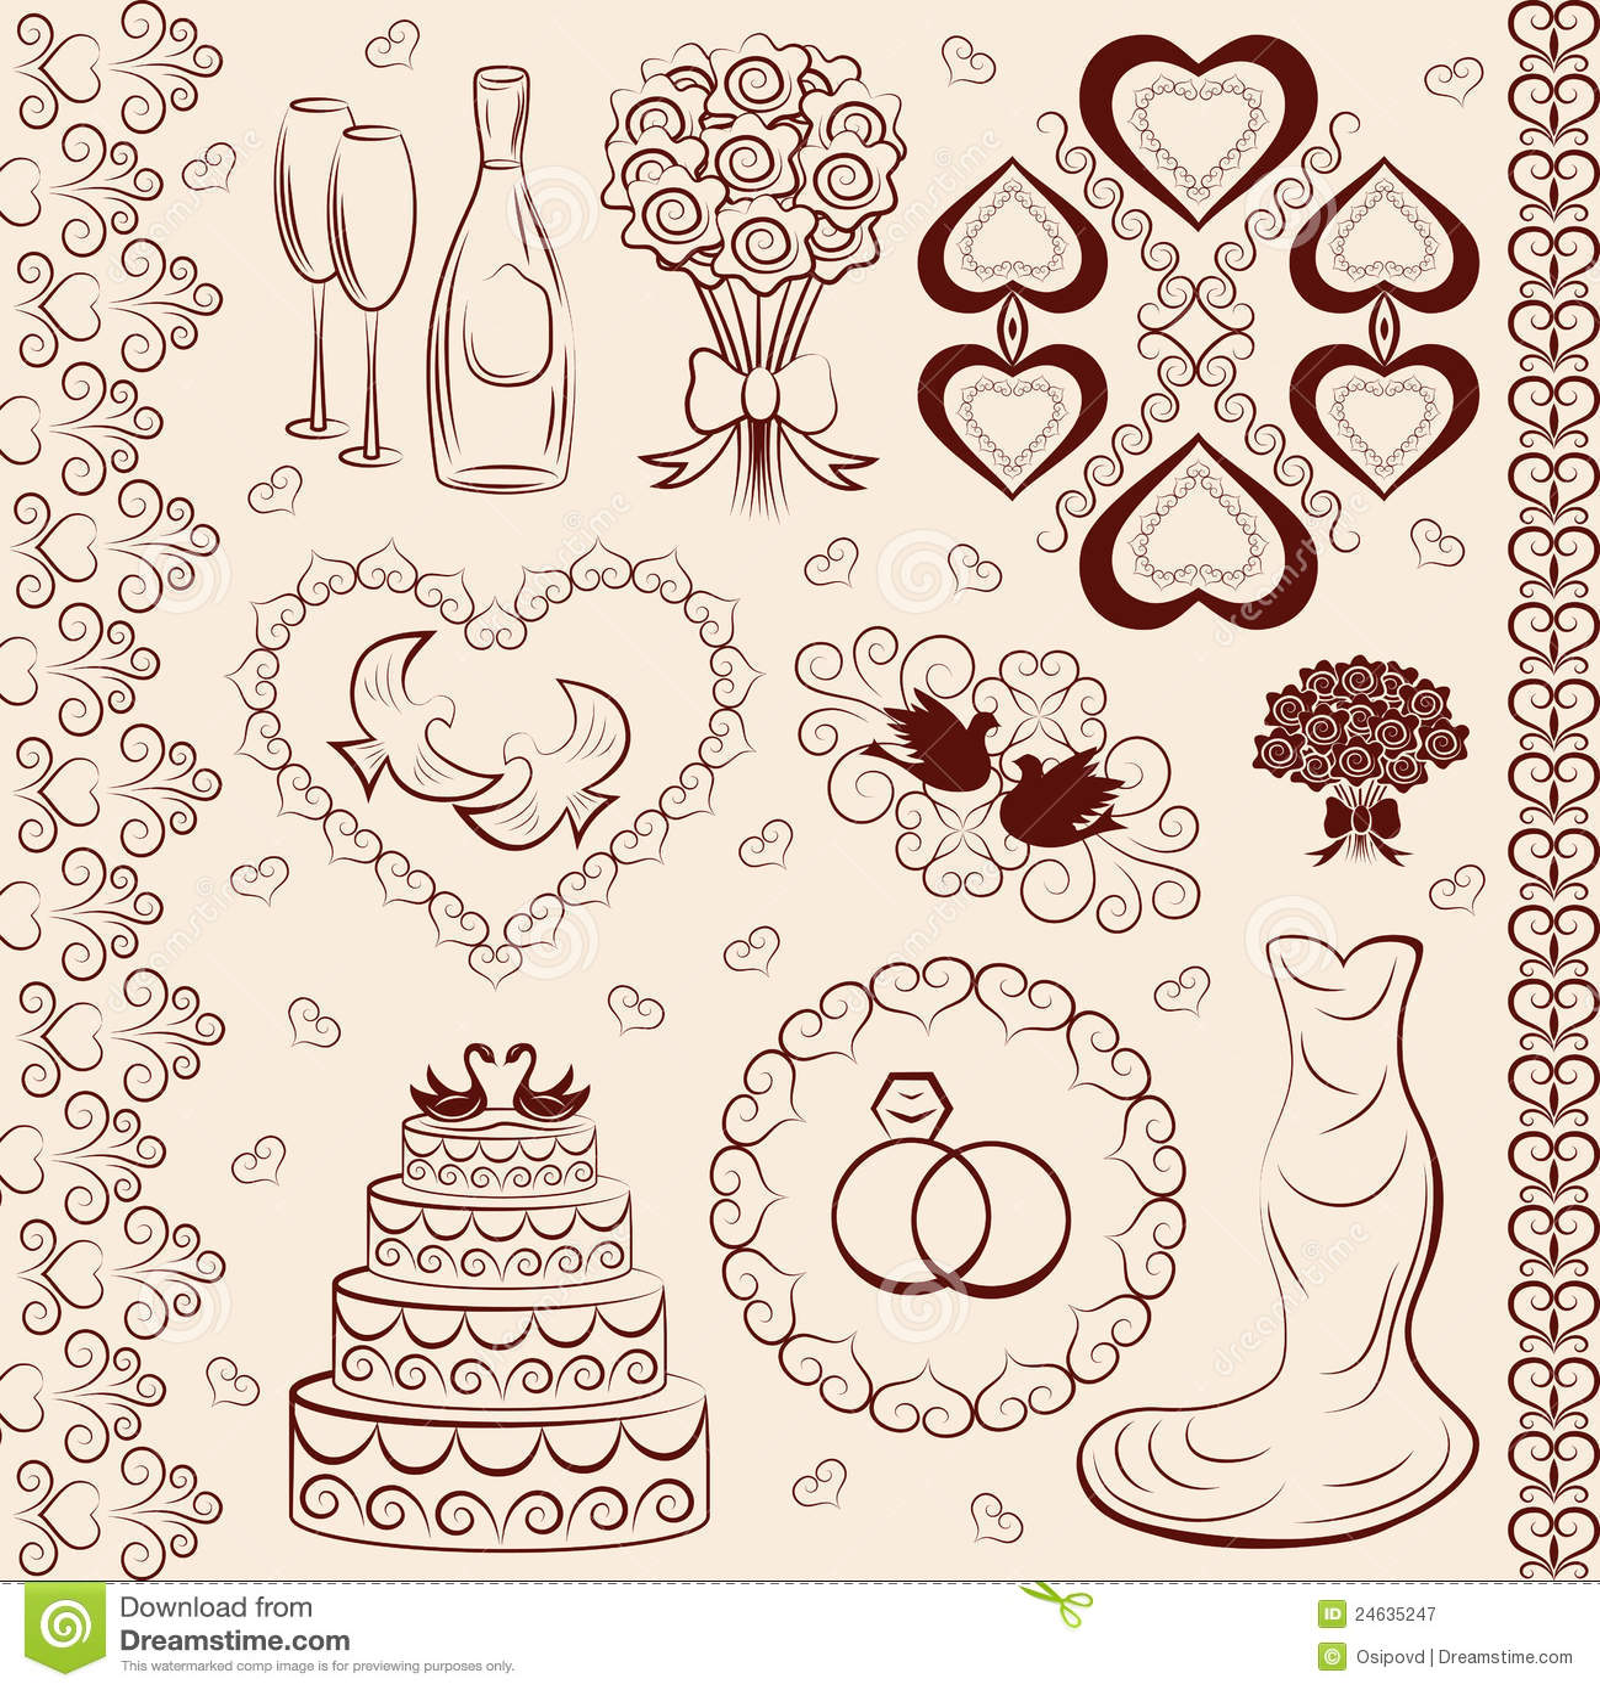 Vector clipart wedding wedding decorations stock vector vector clipart wedding wedding decorations junglespirit Choice Image